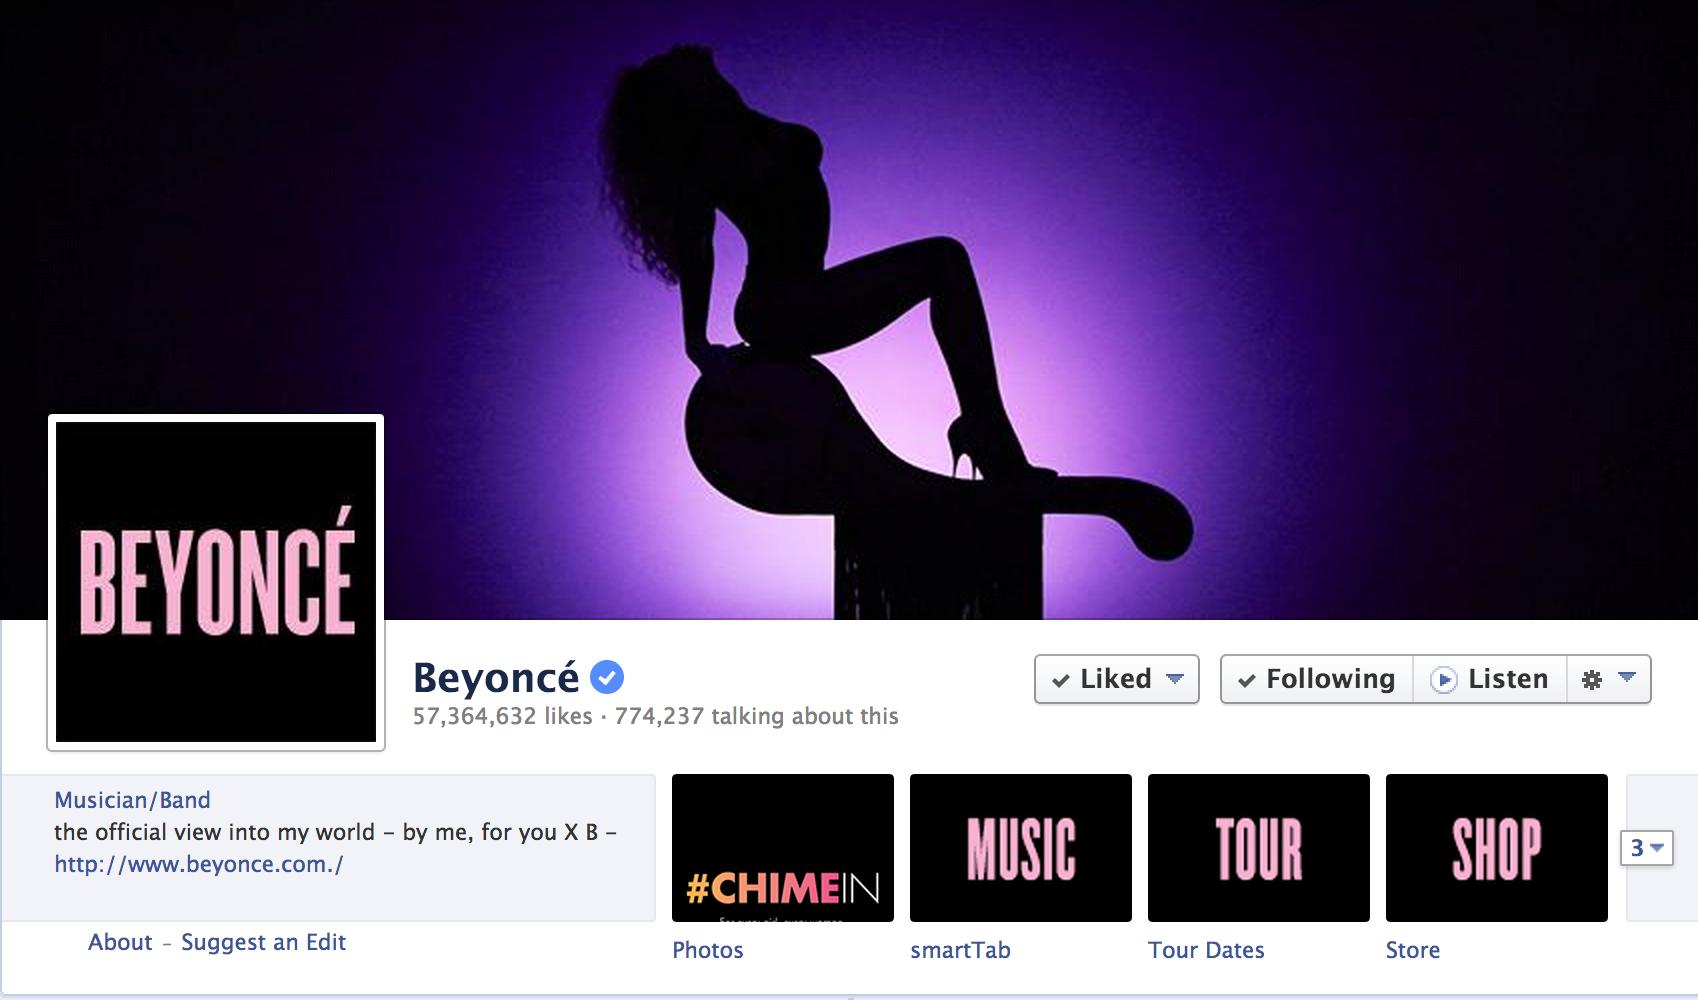 Beyoncé Facebook Top Page 2014